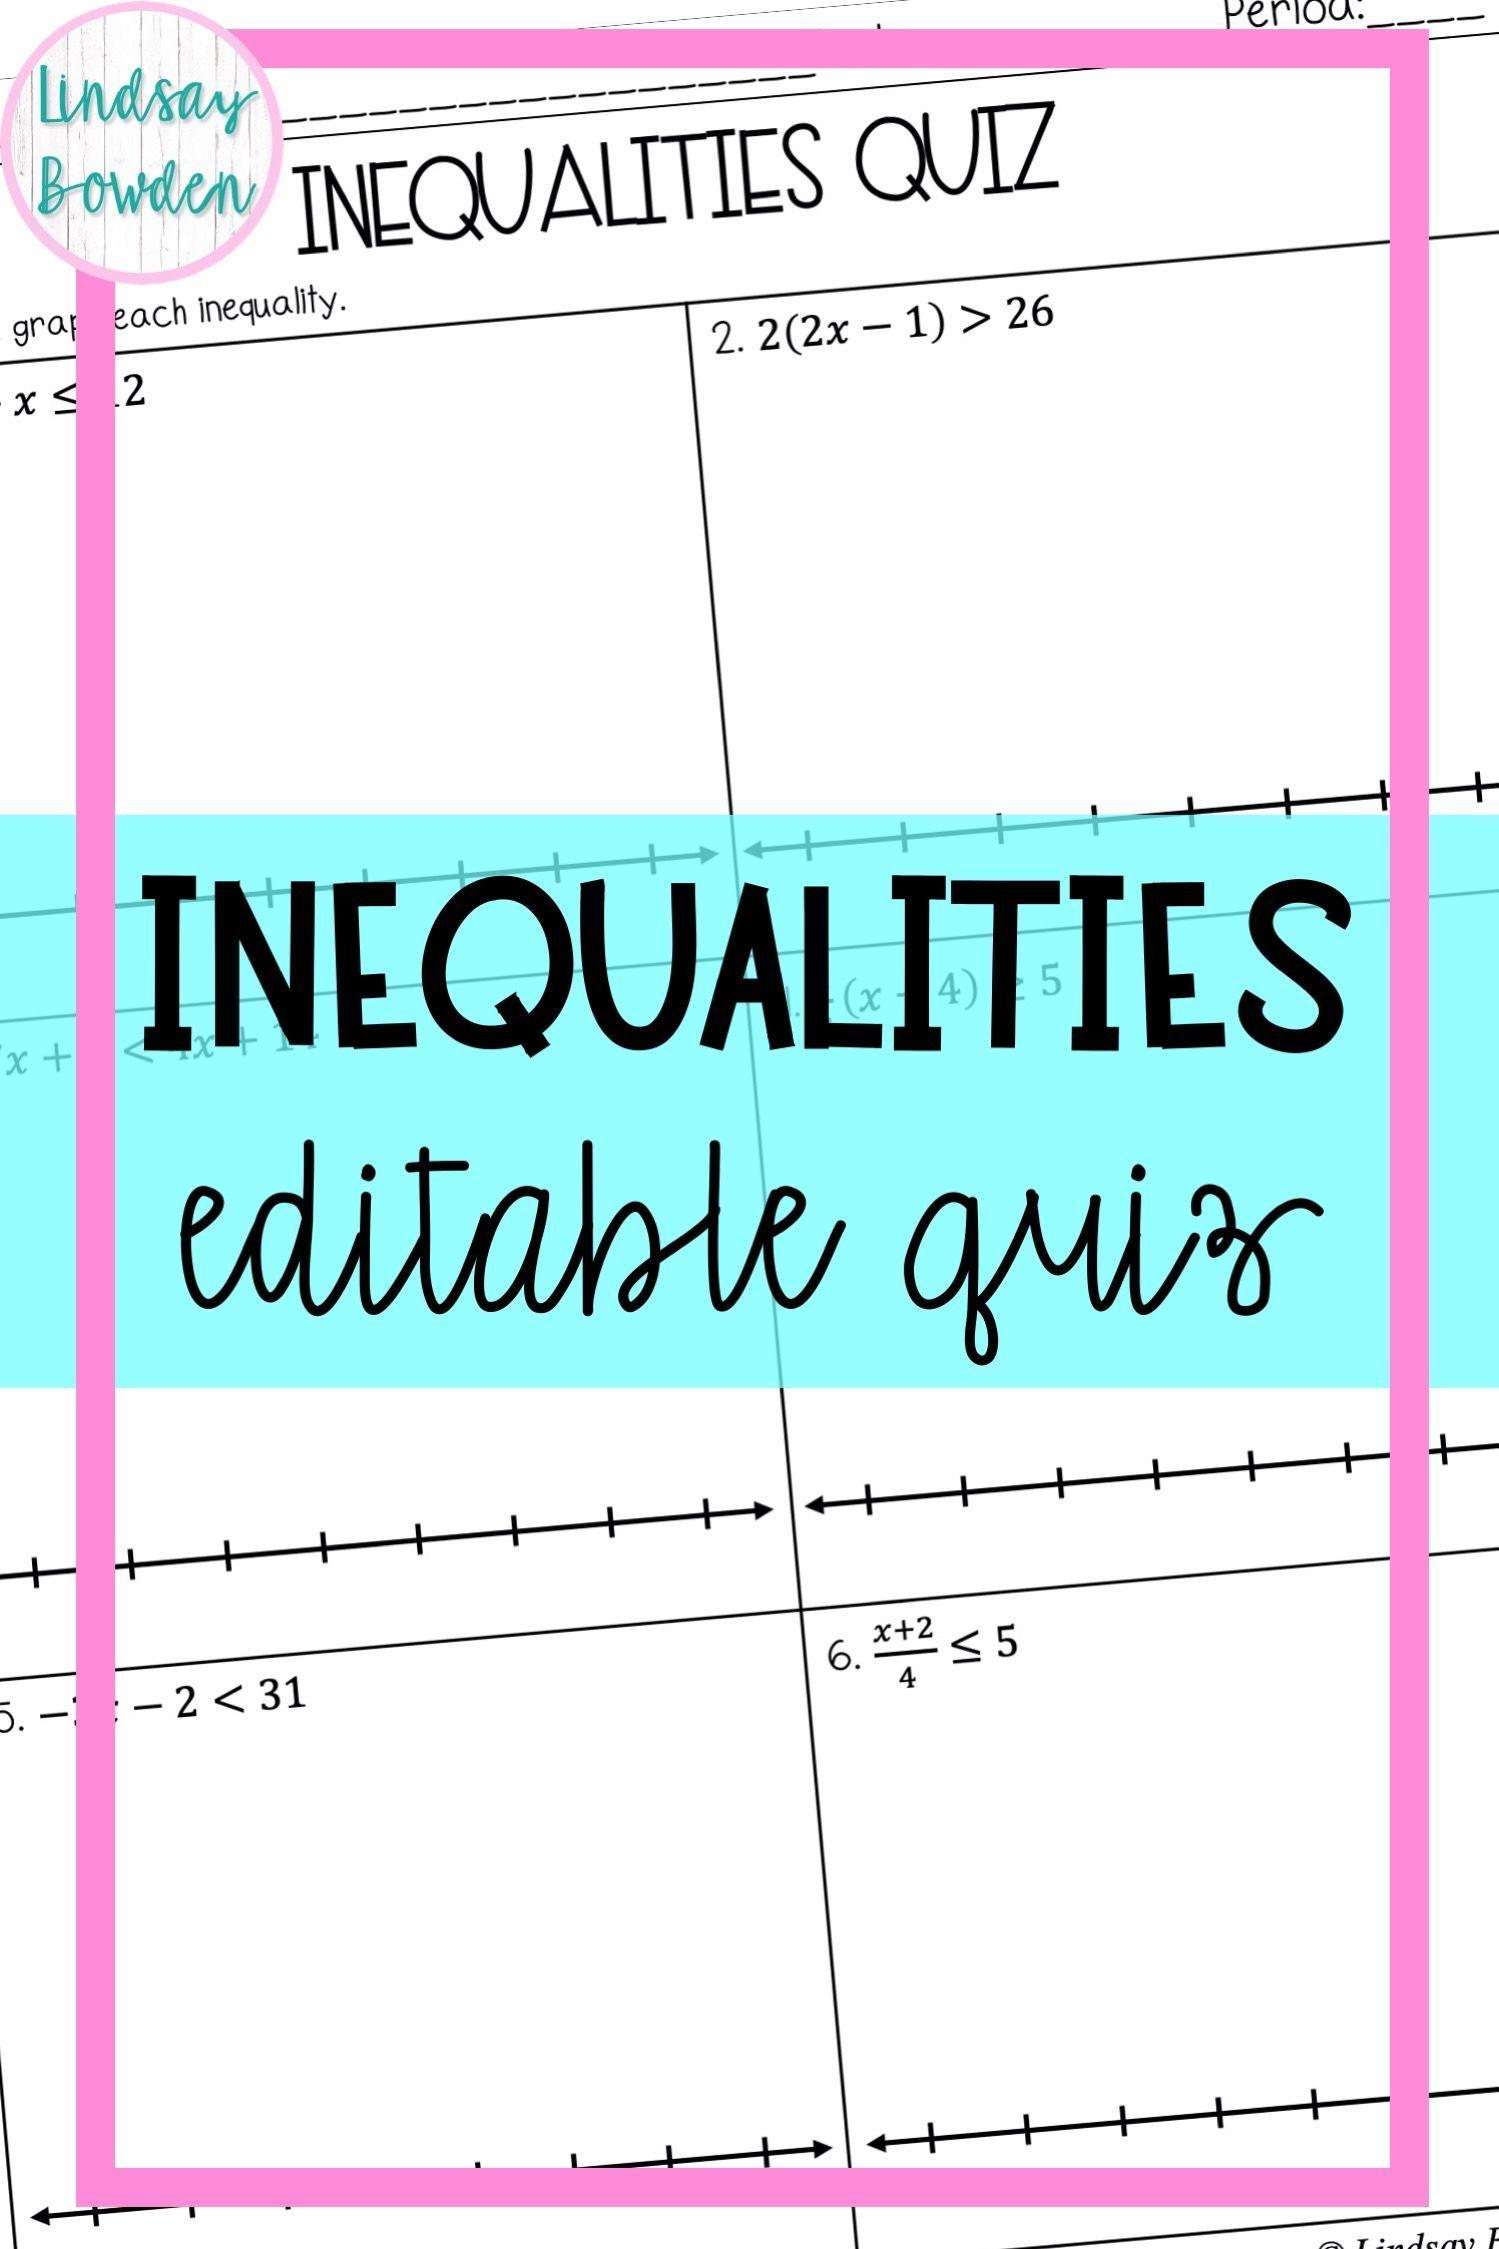 Inequalities Quiz Graphing Inequalities Word Problems Inequality Word Problems